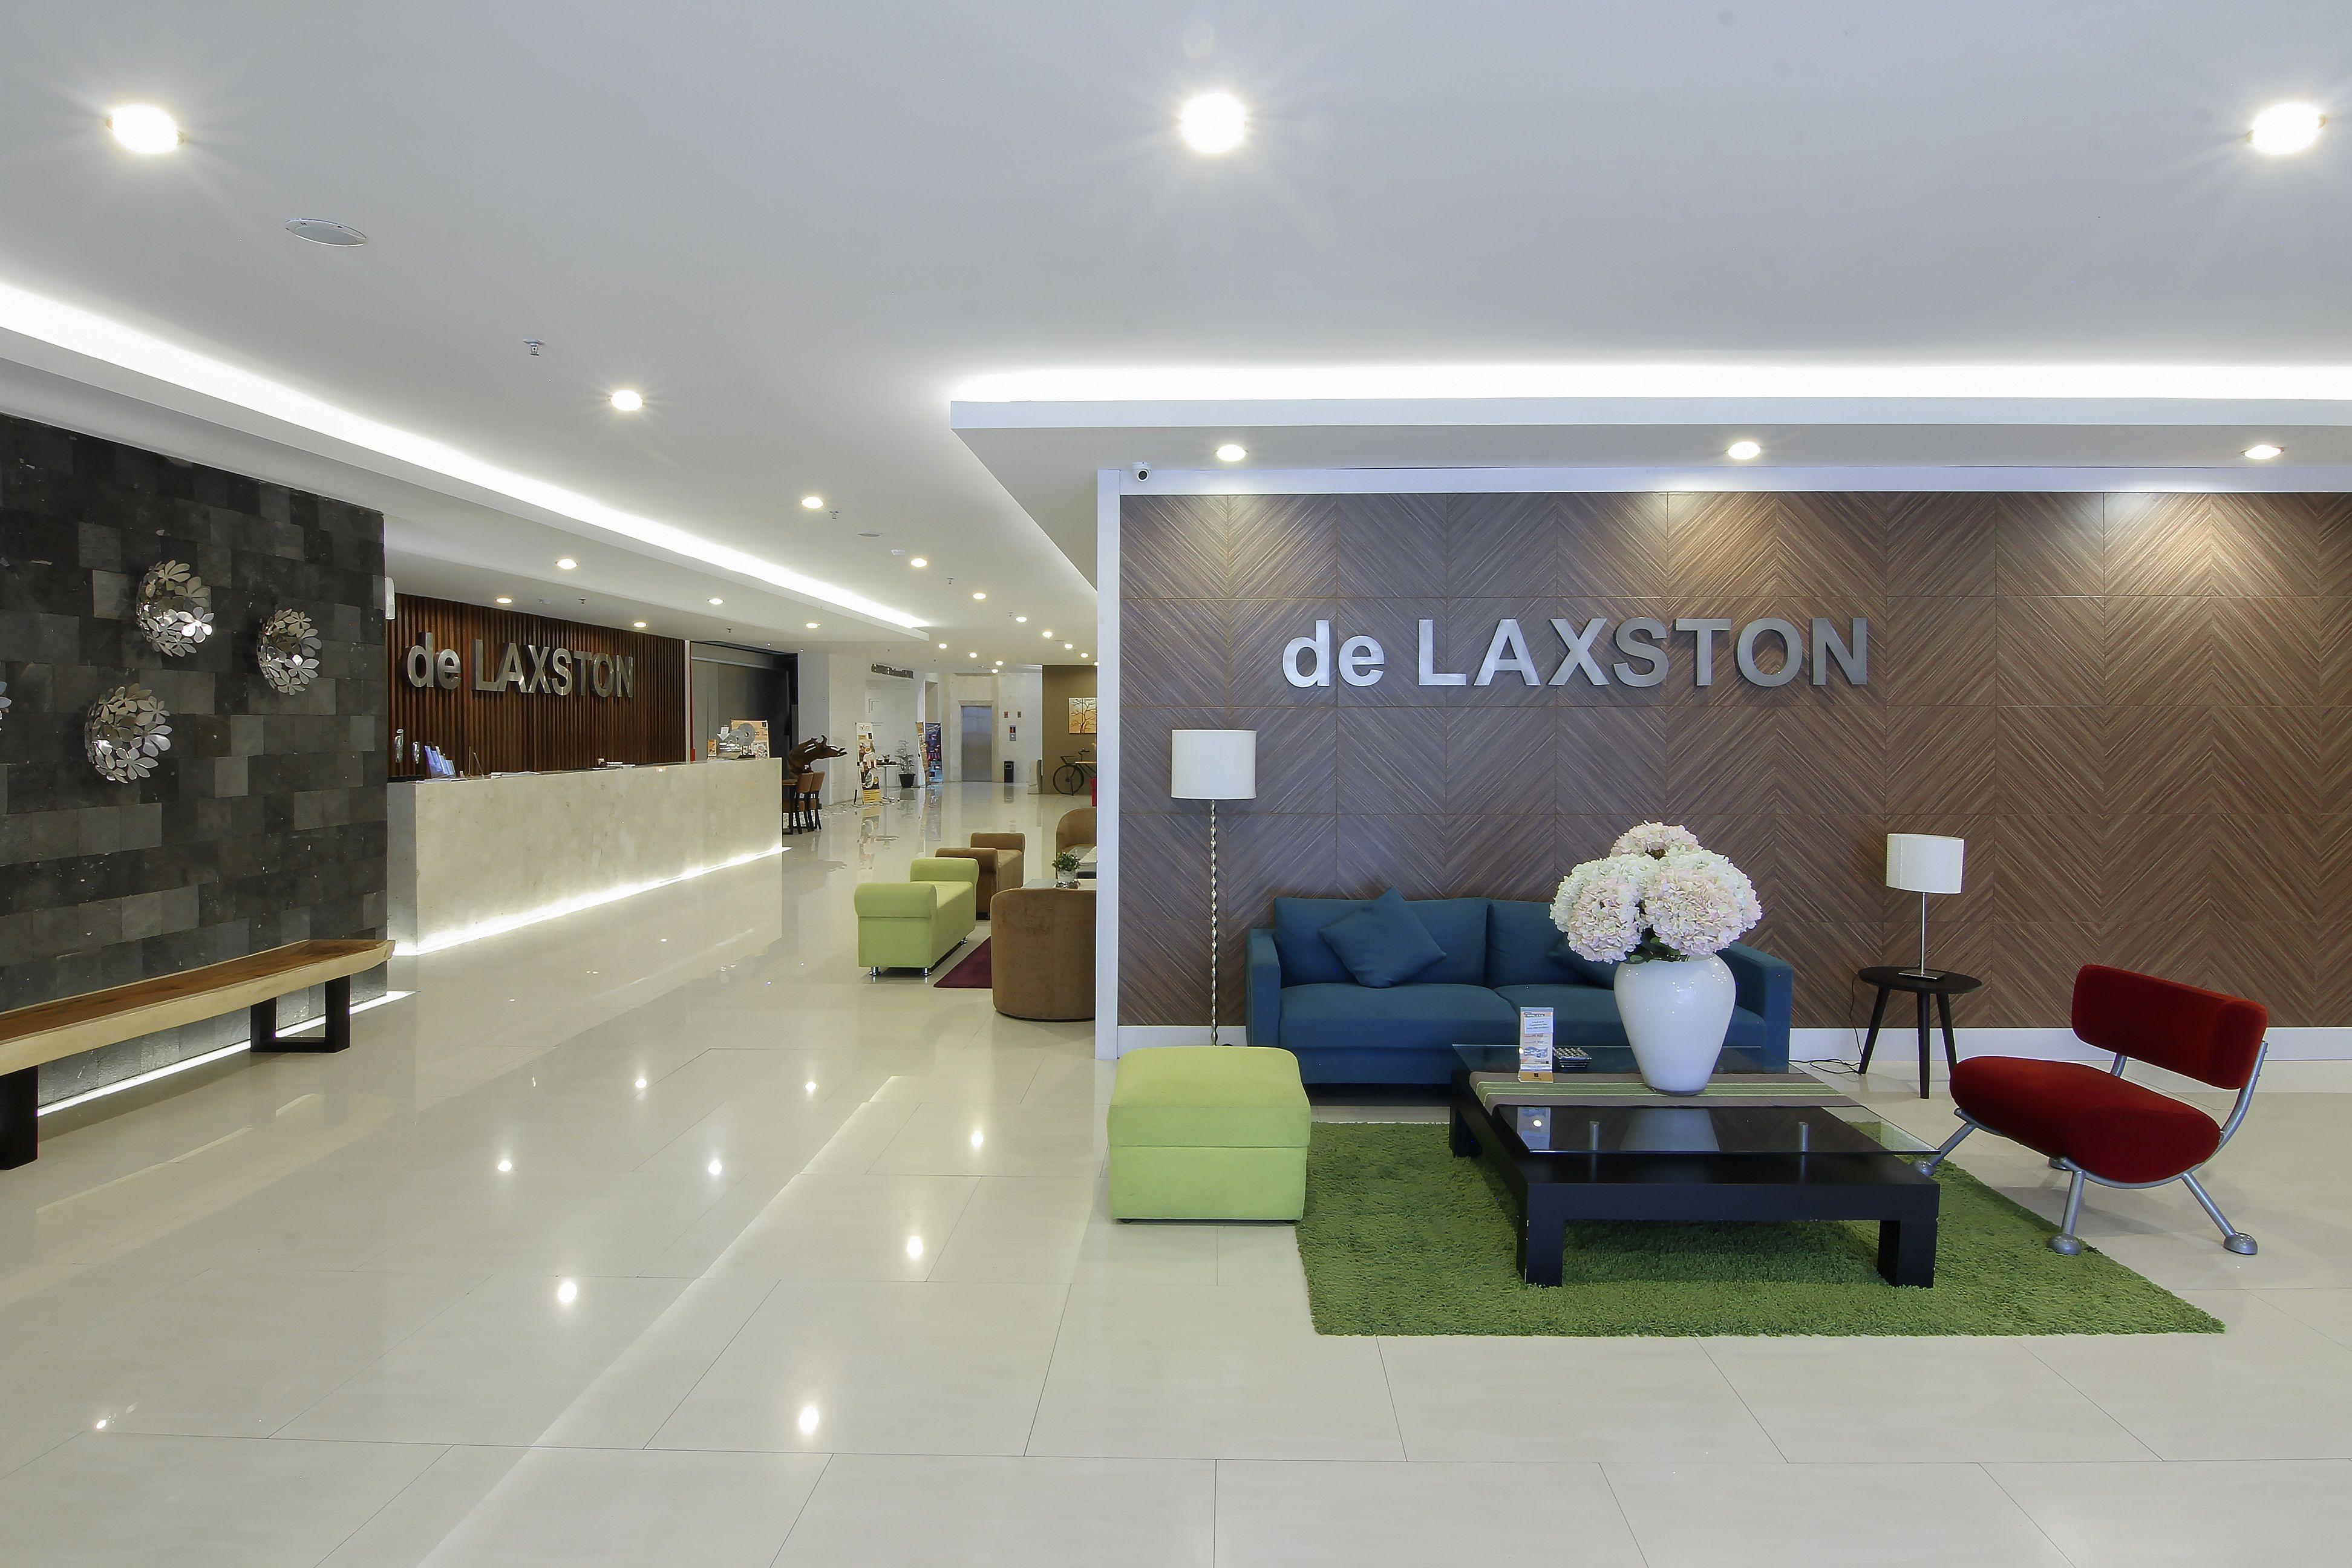 De Laxston Hotel Jogja by Quin's, Yogyakarta